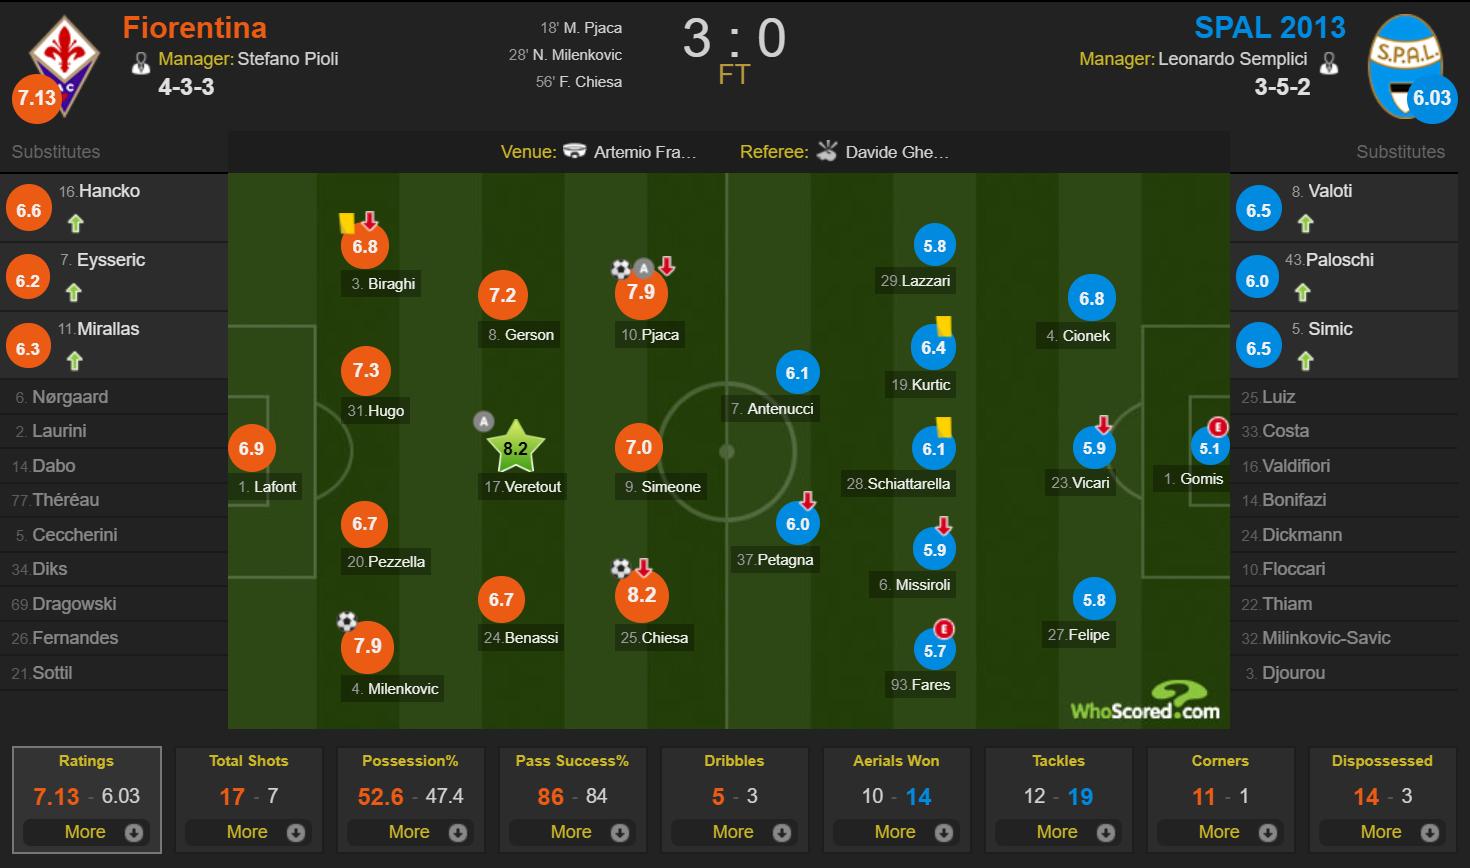 Fiorentina 3-0 SPAL WhoScored raitings